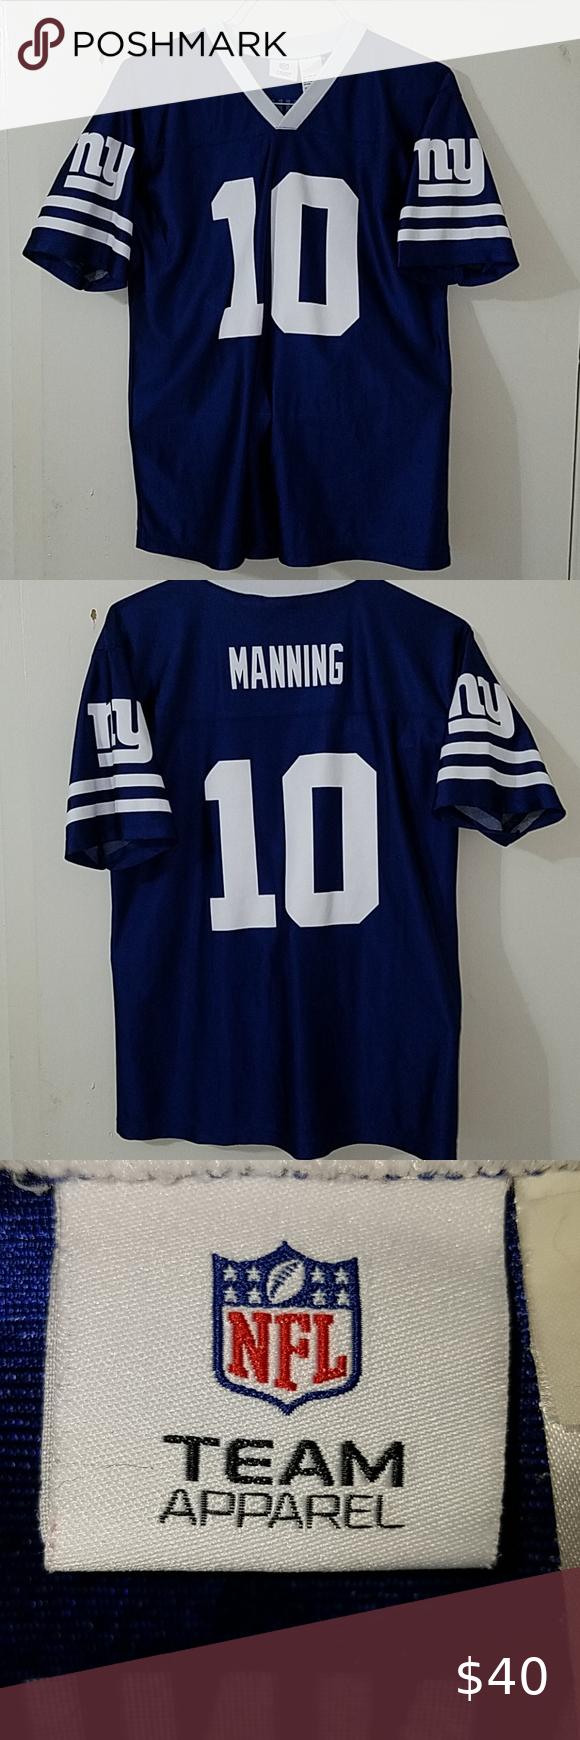 Vintage New York Giants Jersey Eli Manning In 2020 New York Giants Jersey Vintage New York New York Giants